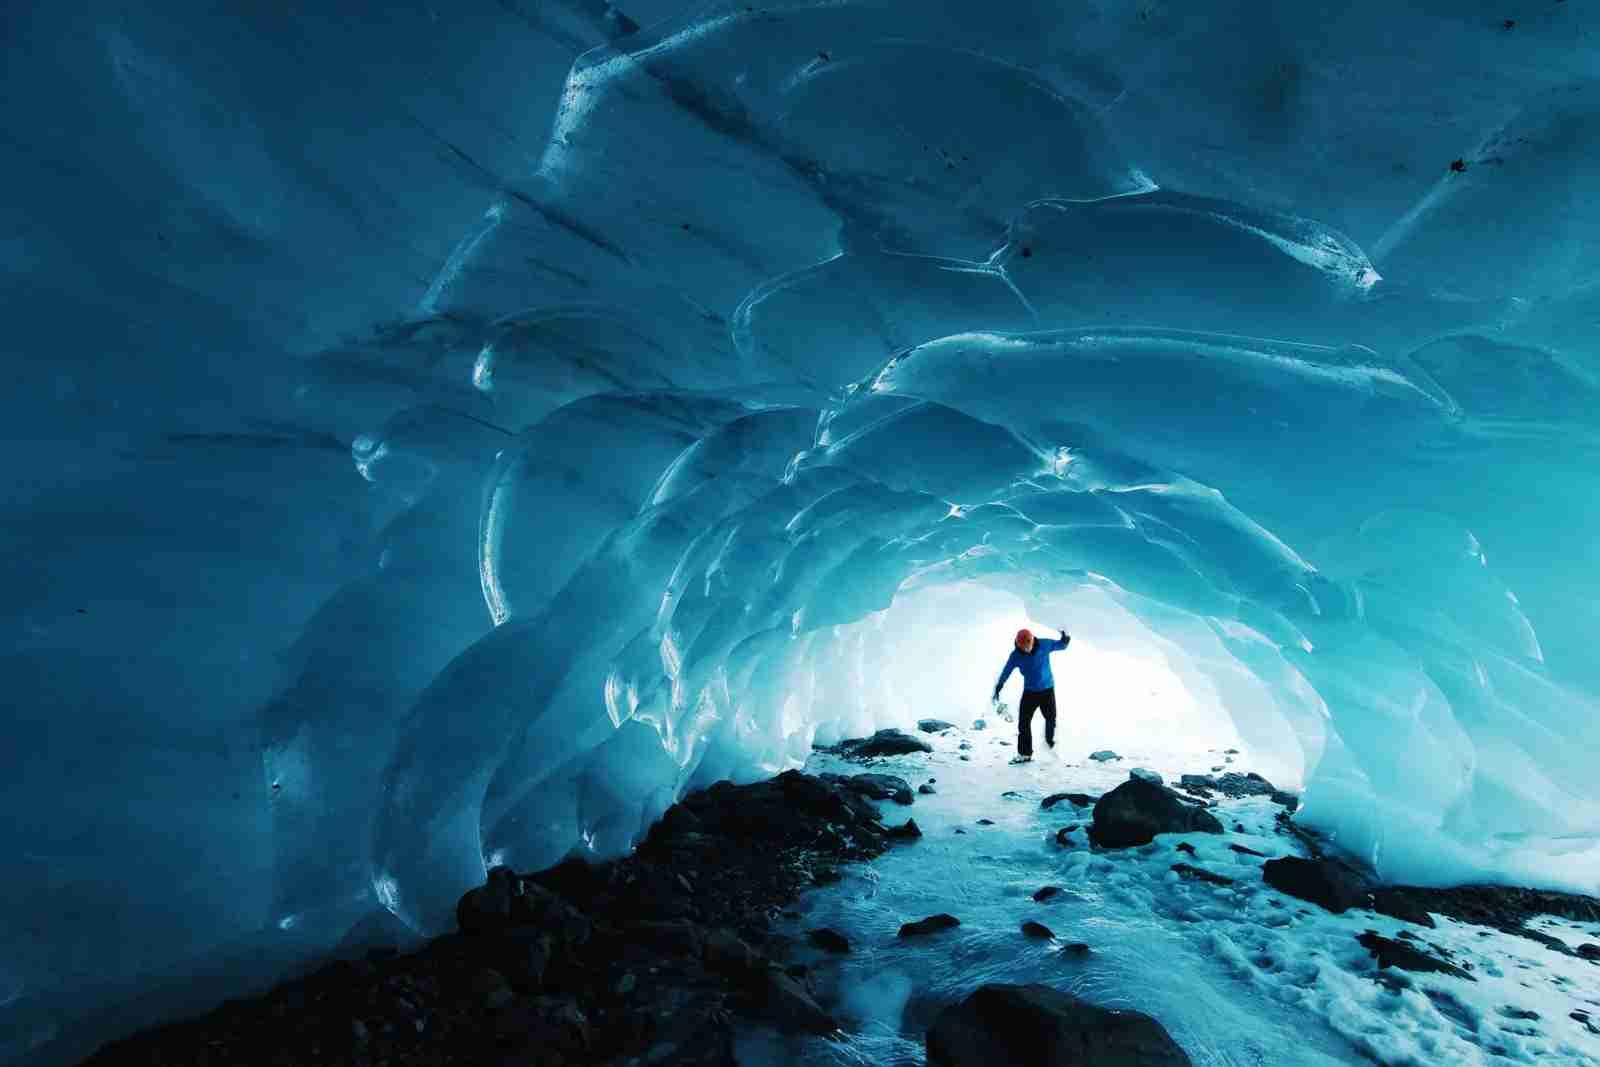 An ice cave in Chugach National Forest, Seward, Alaska. (Photo by Paxson Woelber/Unsplash)